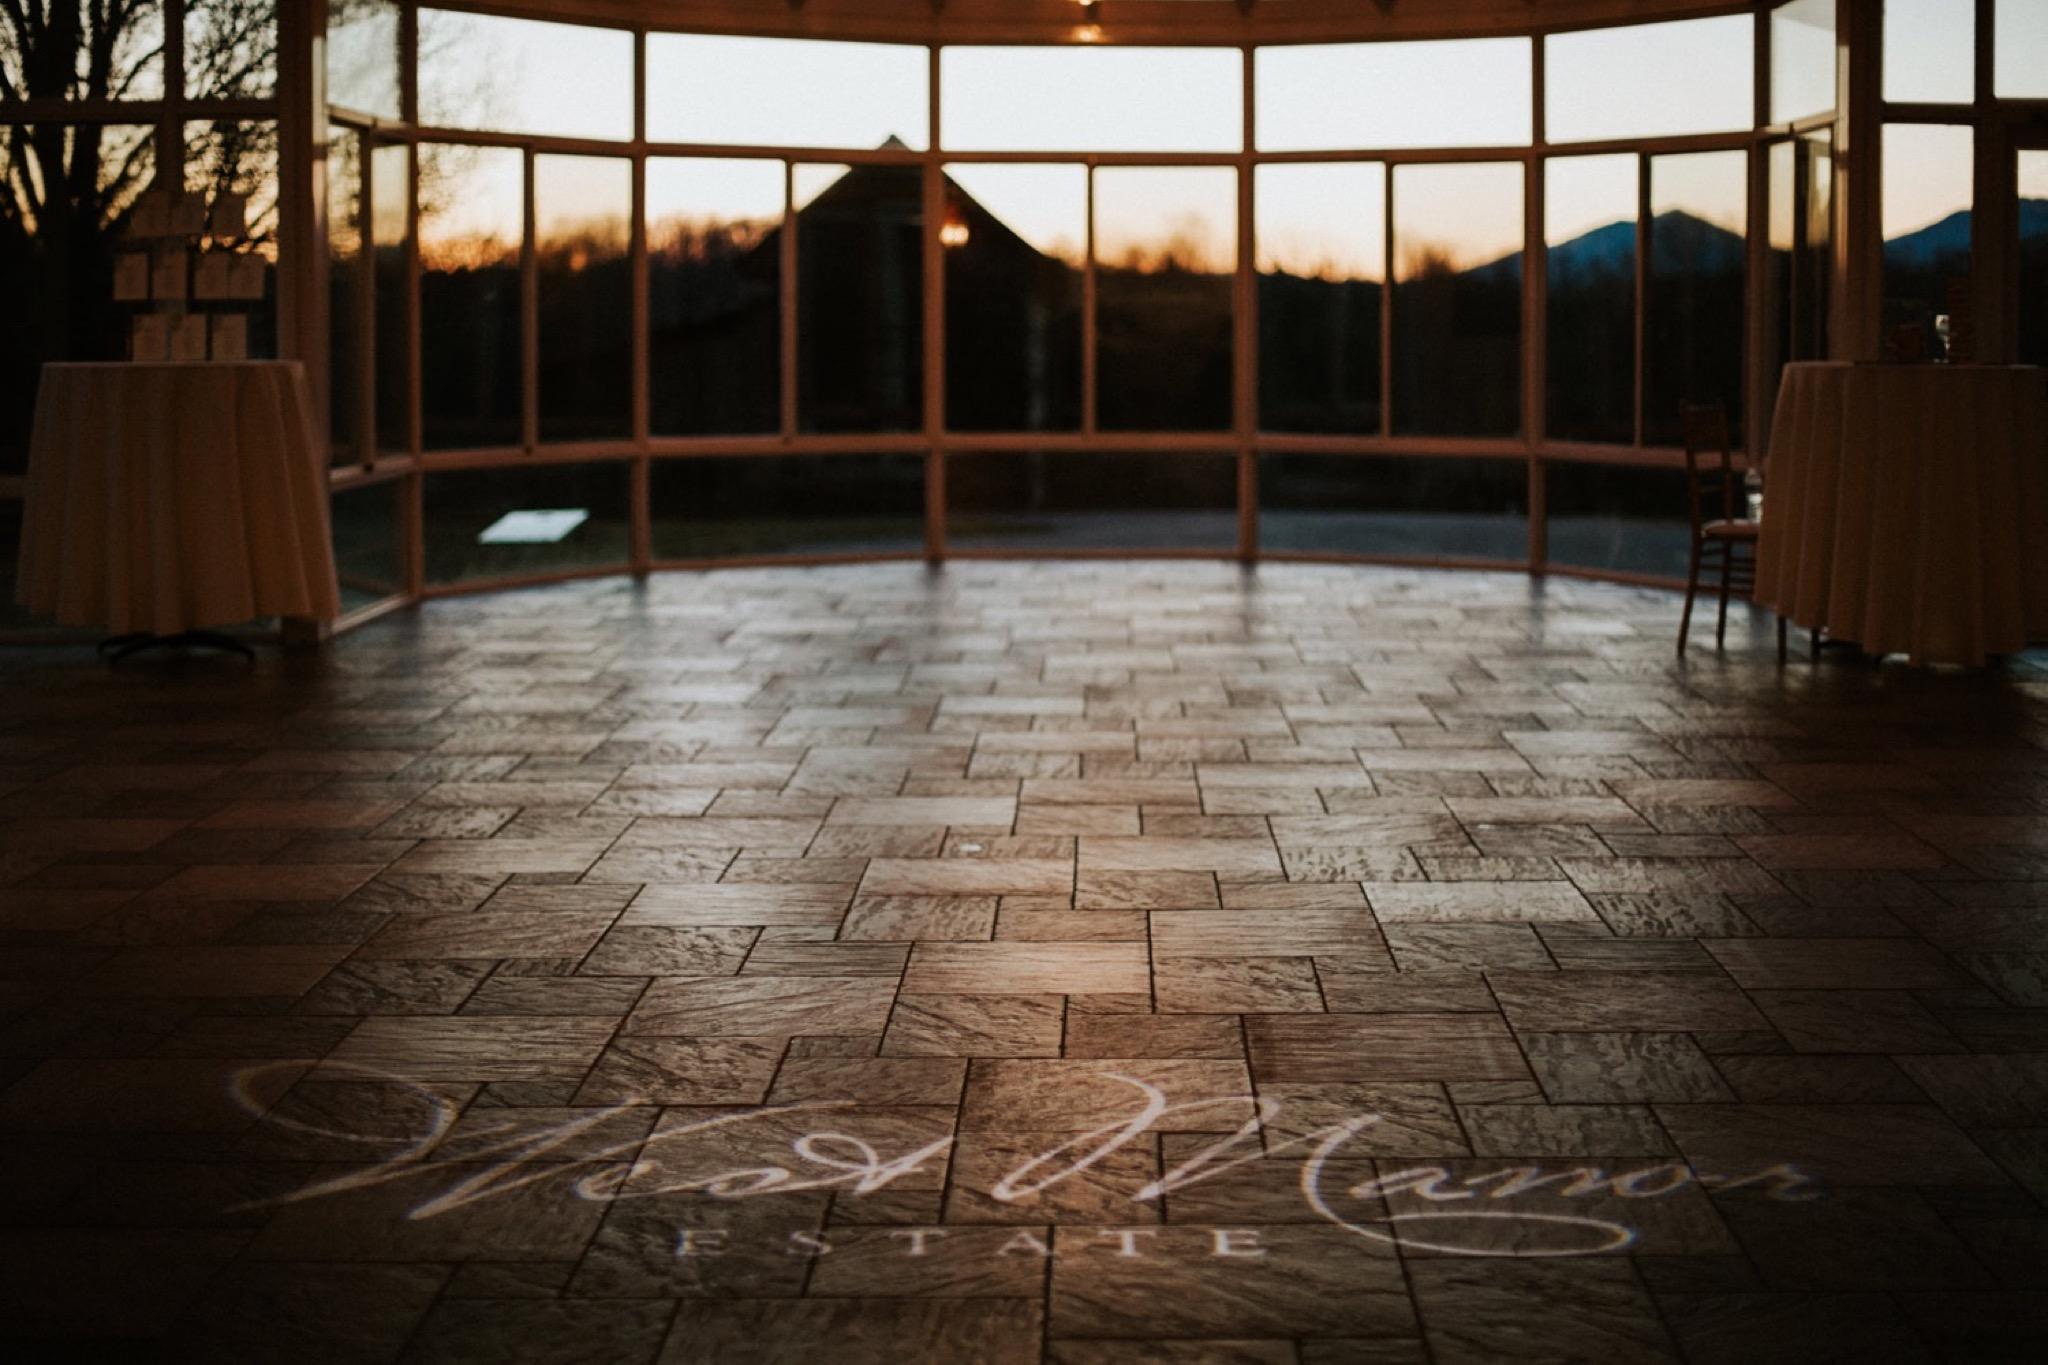 80_West Manor Estate Weddings - Pat Cori Photography-174_Weddingvenue_WestManorEstate_VirginiaWeddingPhotographer.jpg